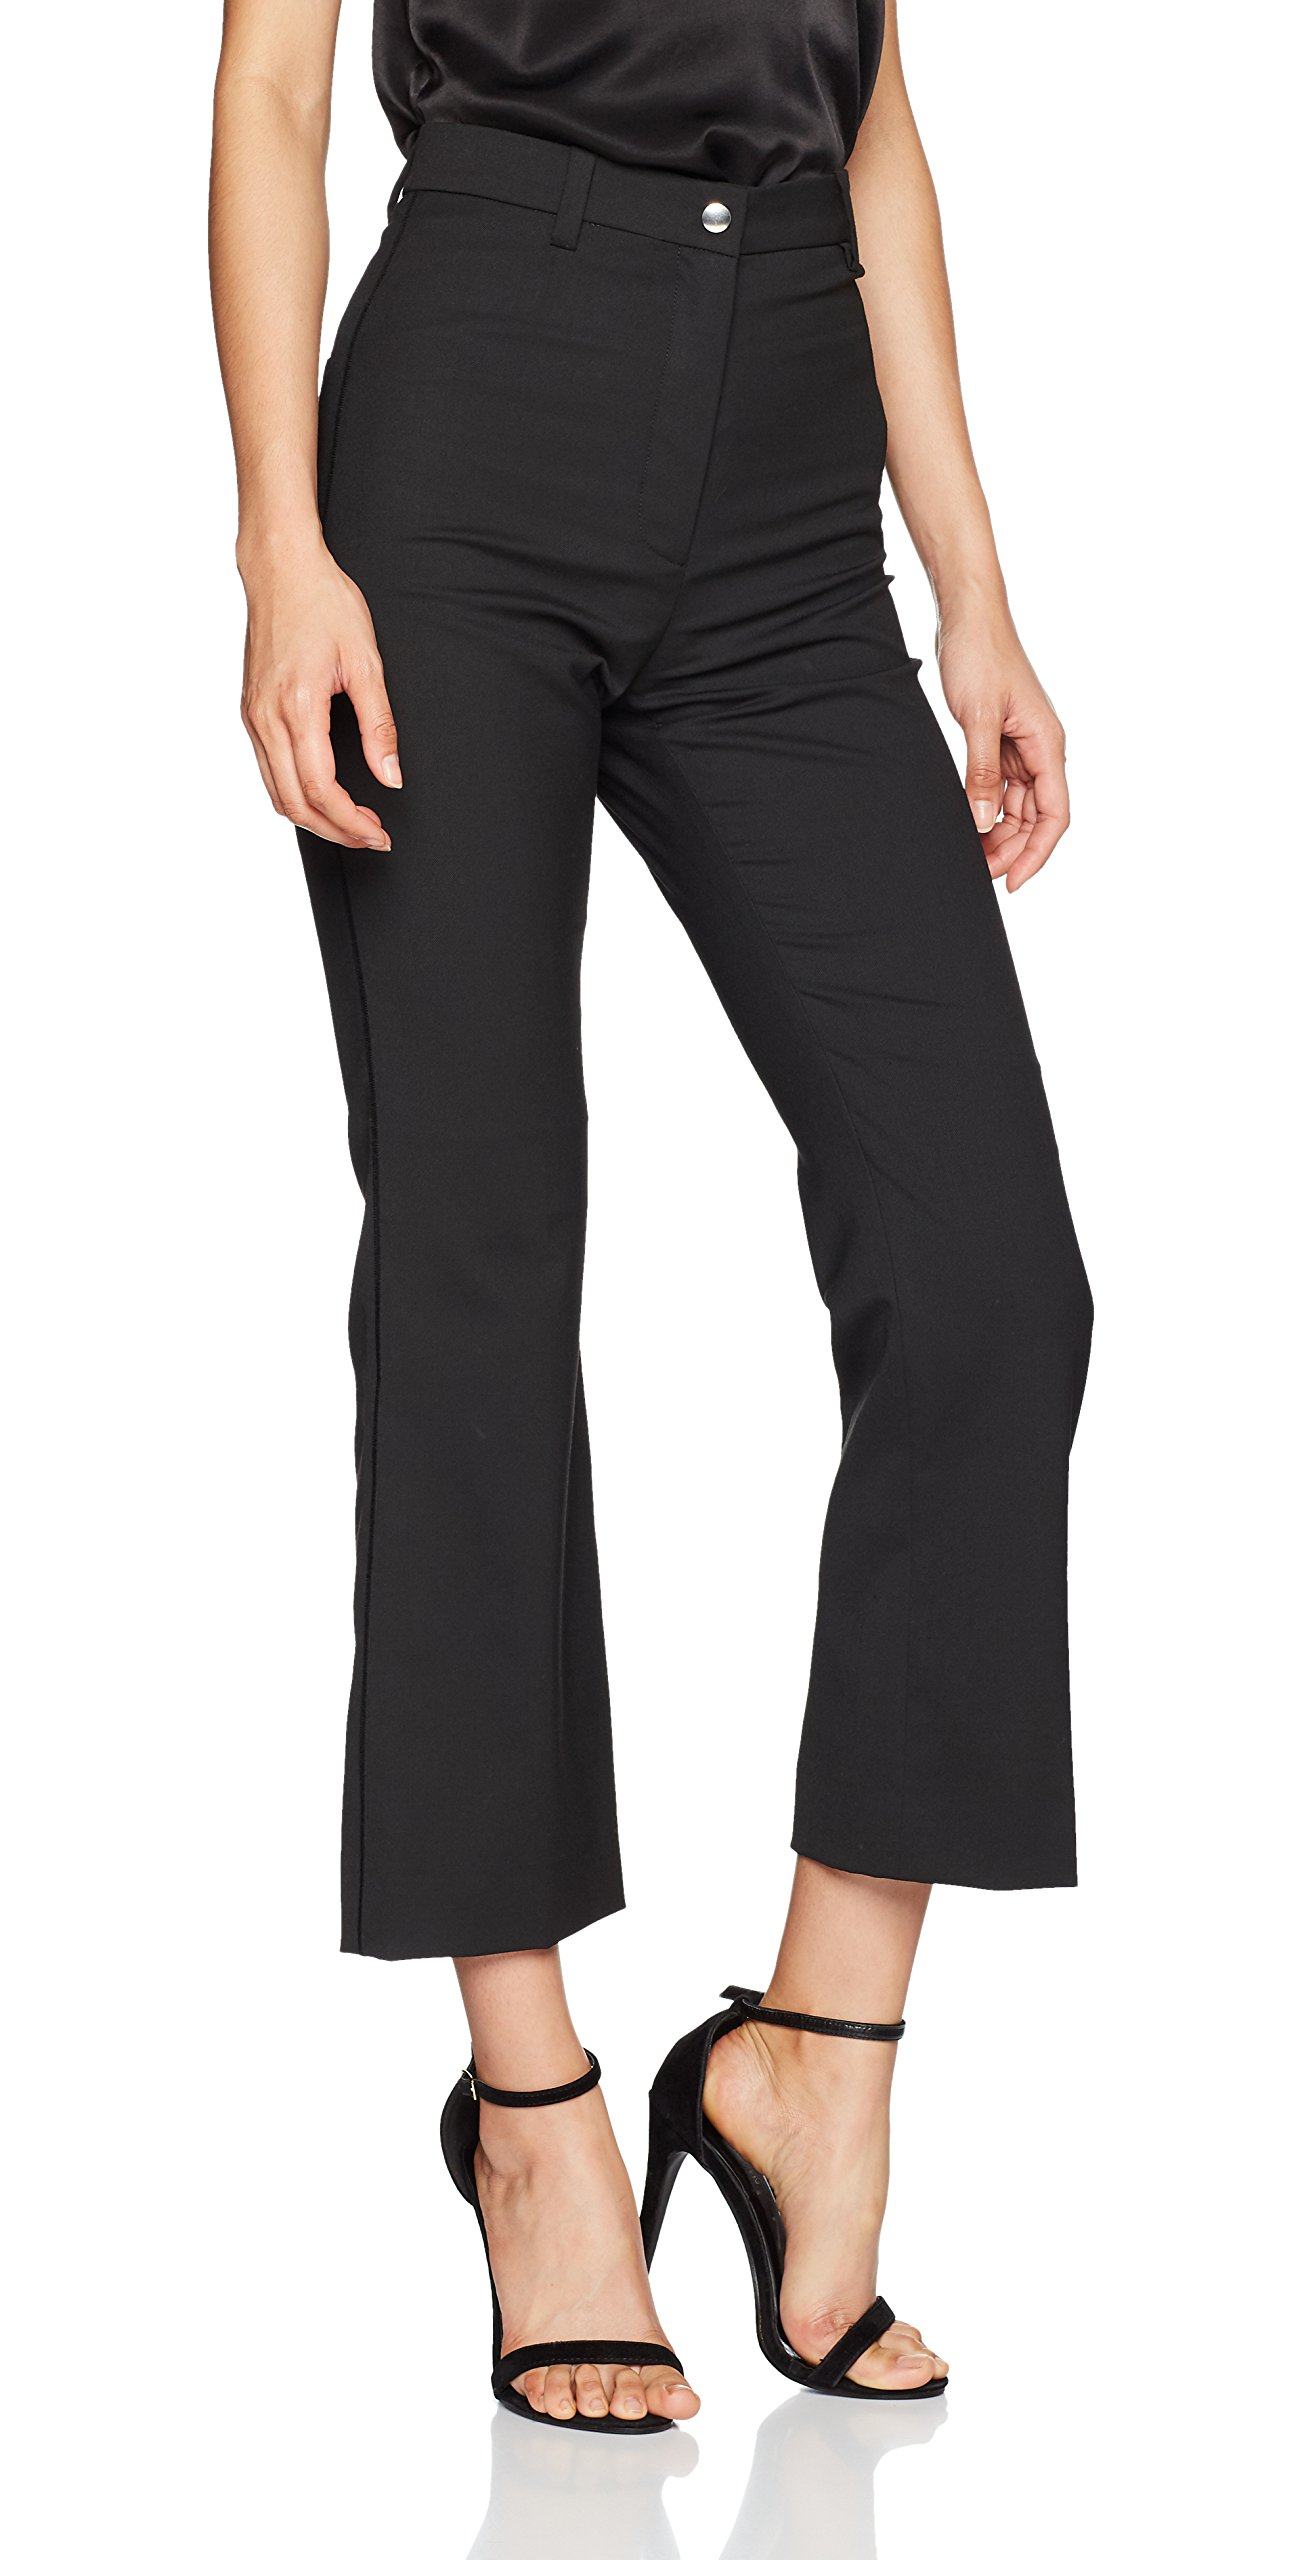 Pantalon Liva Trousers Wood Noirblack10taille Fabricant38Femme tQrCxshBdo